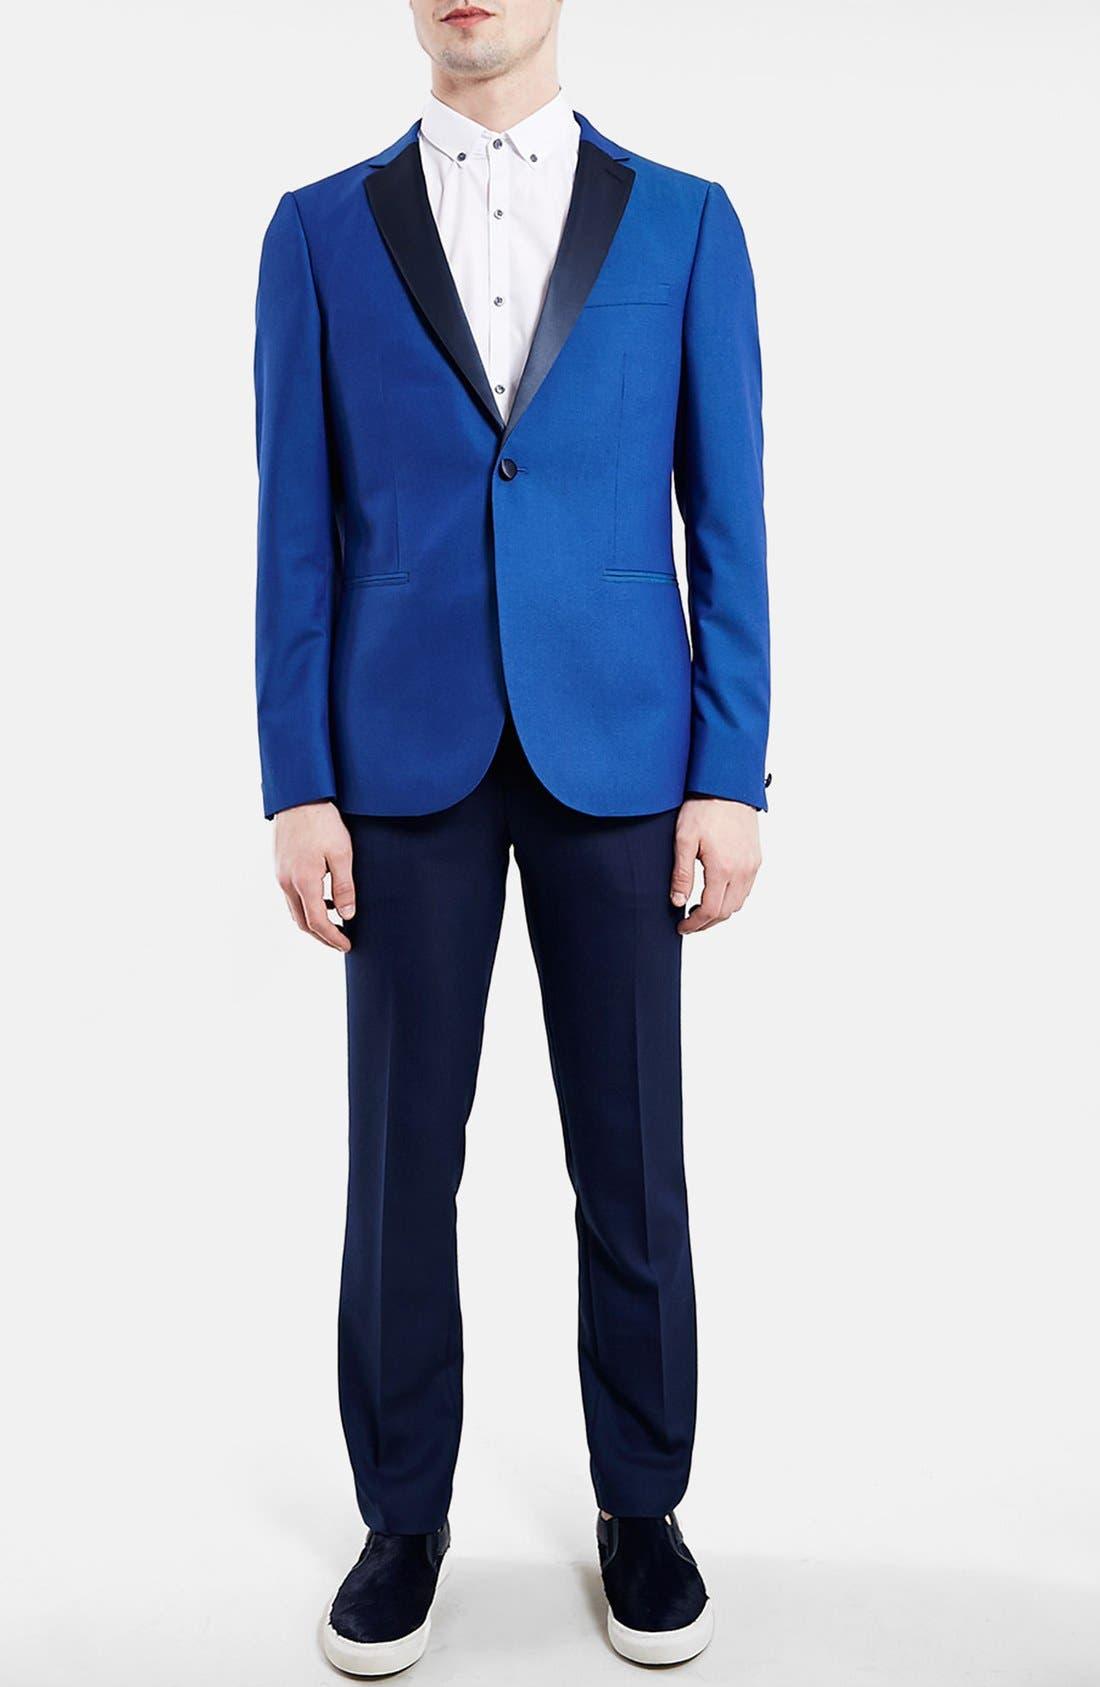 TOPMAN, Blue Skinny Fit Tuxedo Jacket, Alternate thumbnail 2, color, 400